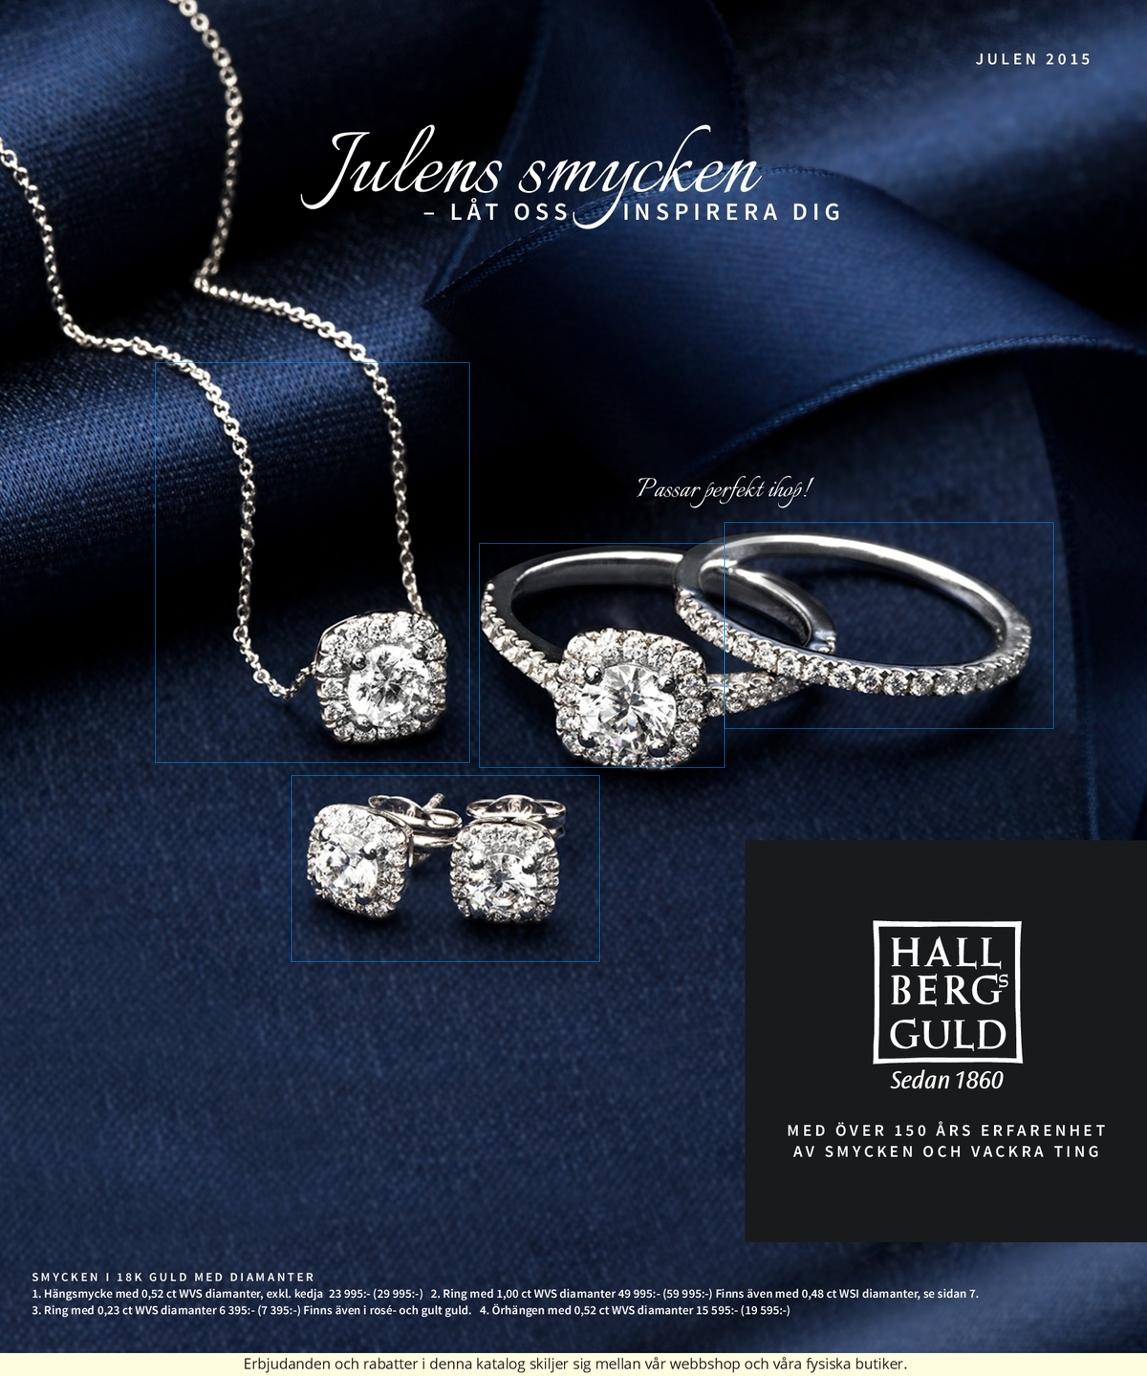 Hallbergs Guld Julkatalog 2015 0537f64f40ce8